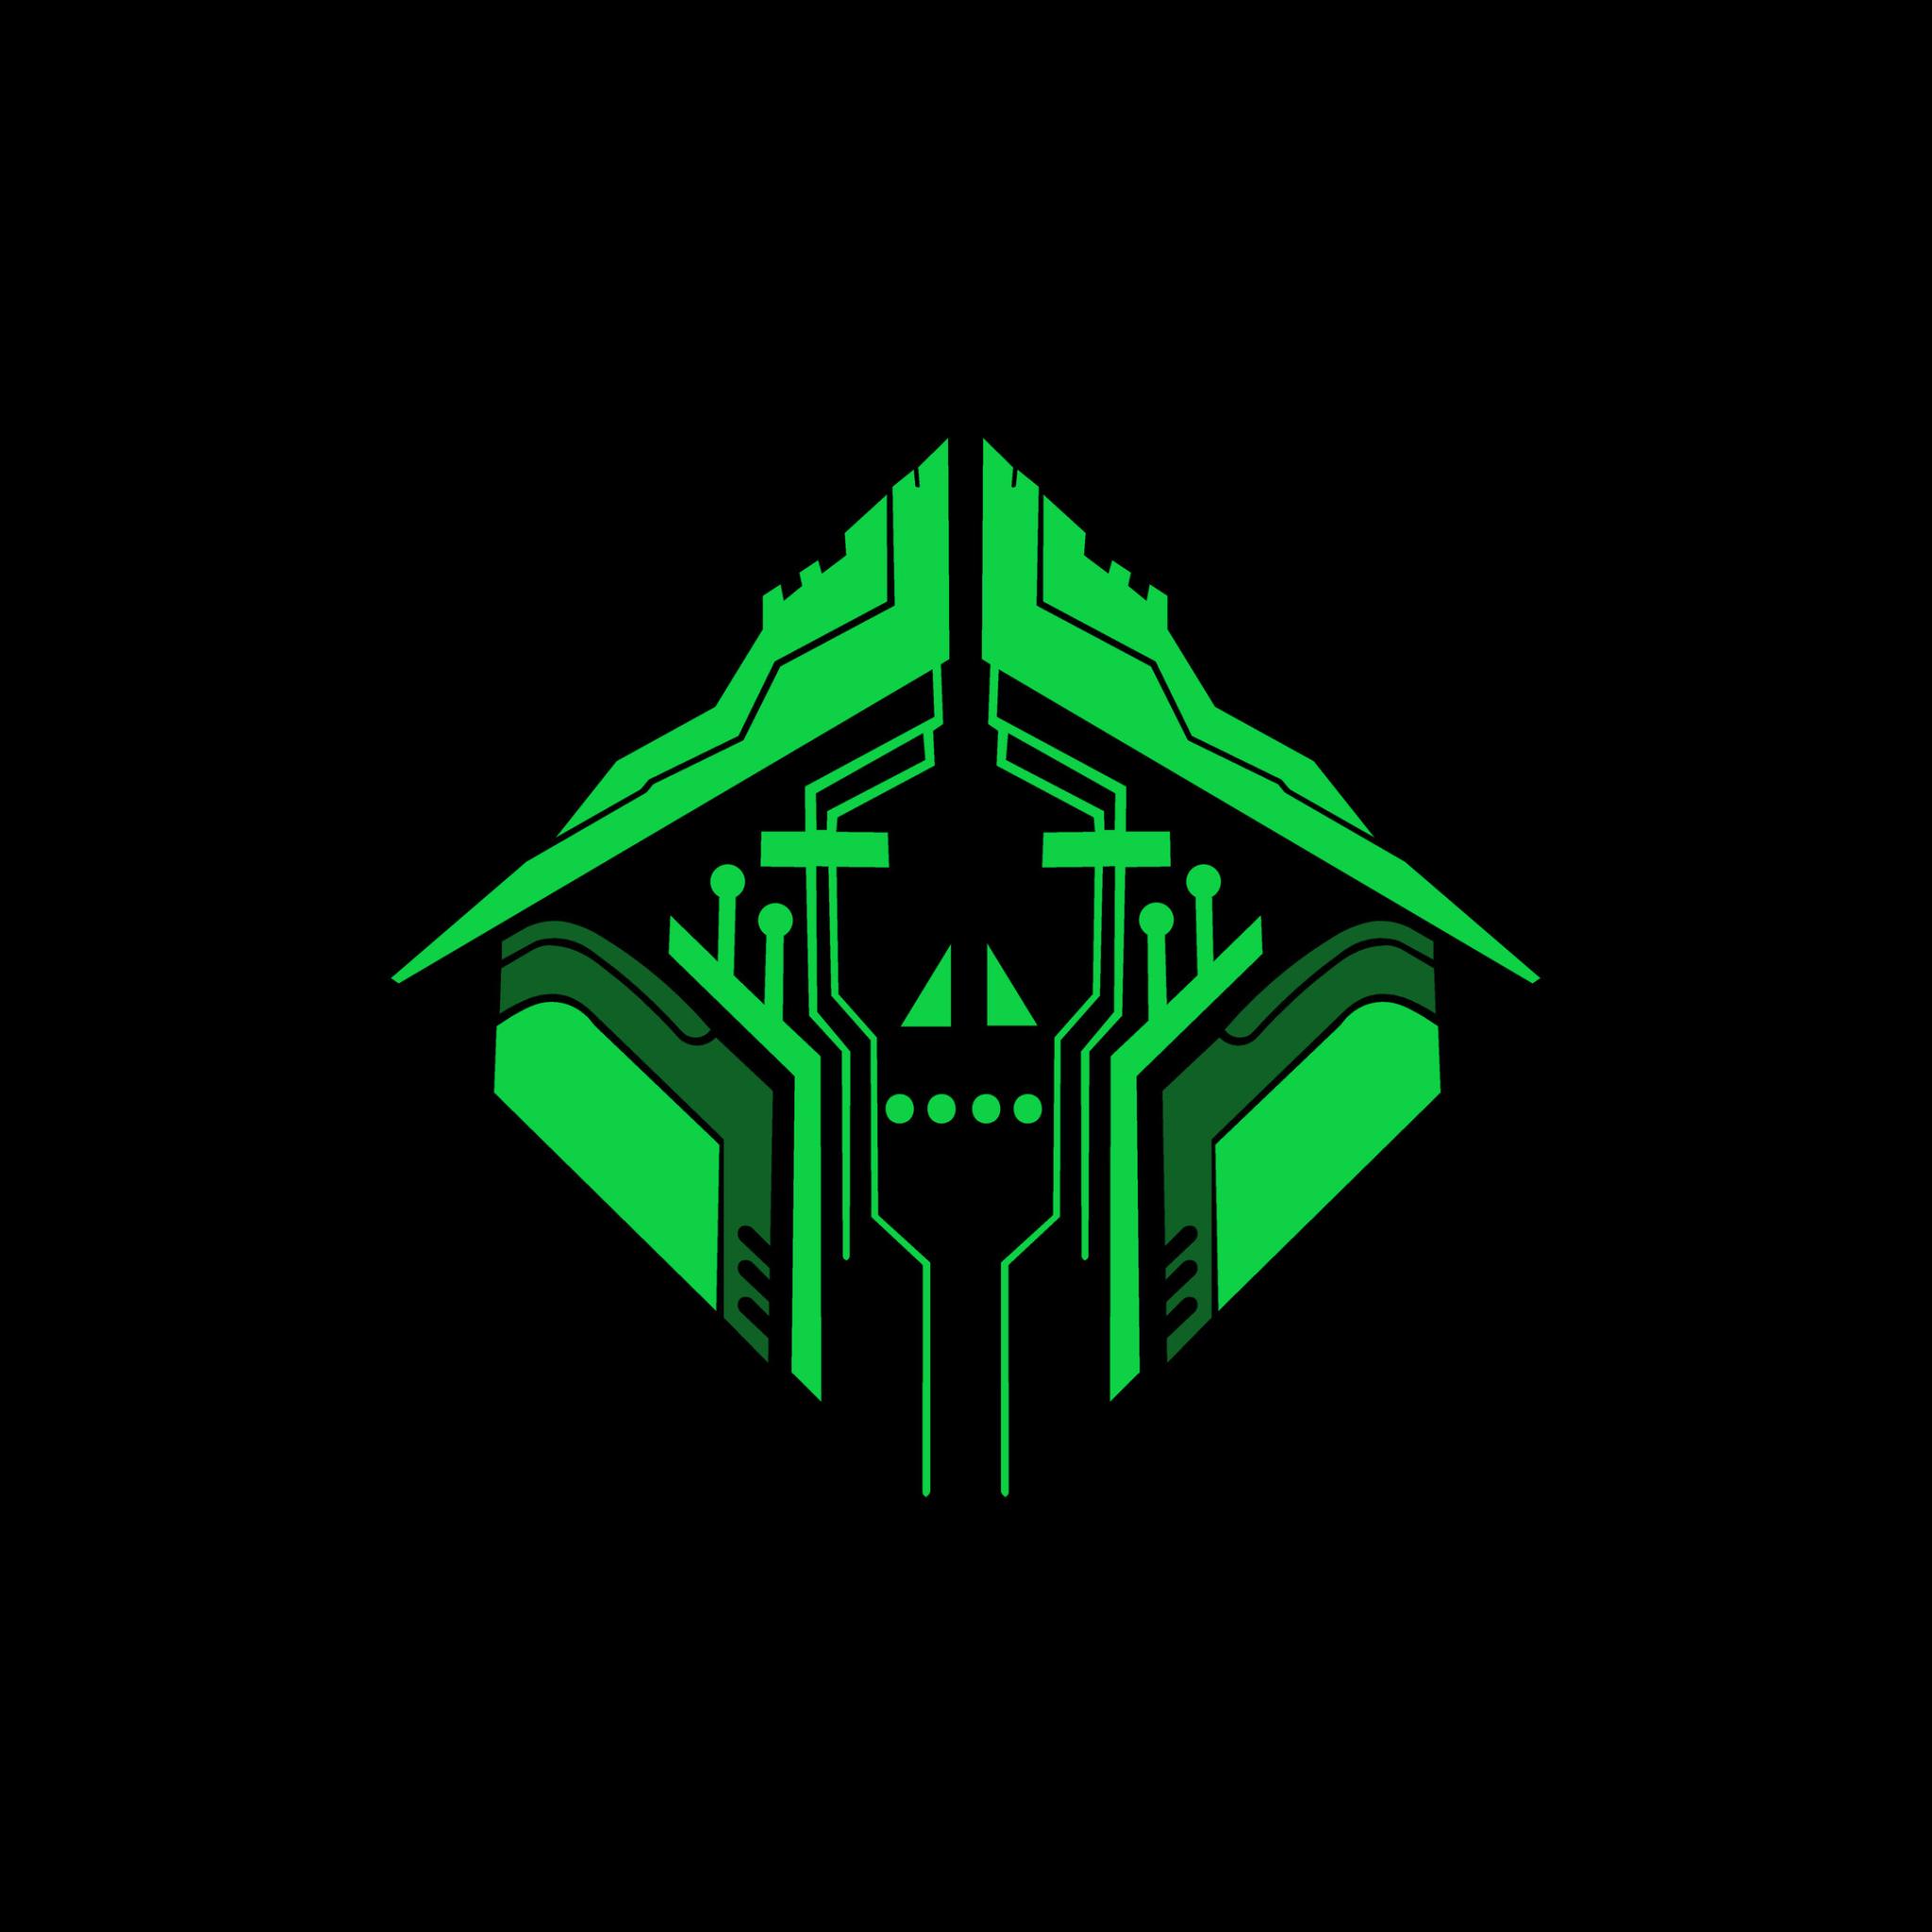 2048x2048 Crypto Apex Legends 4K Logo Ipad Air Wallpaper ...